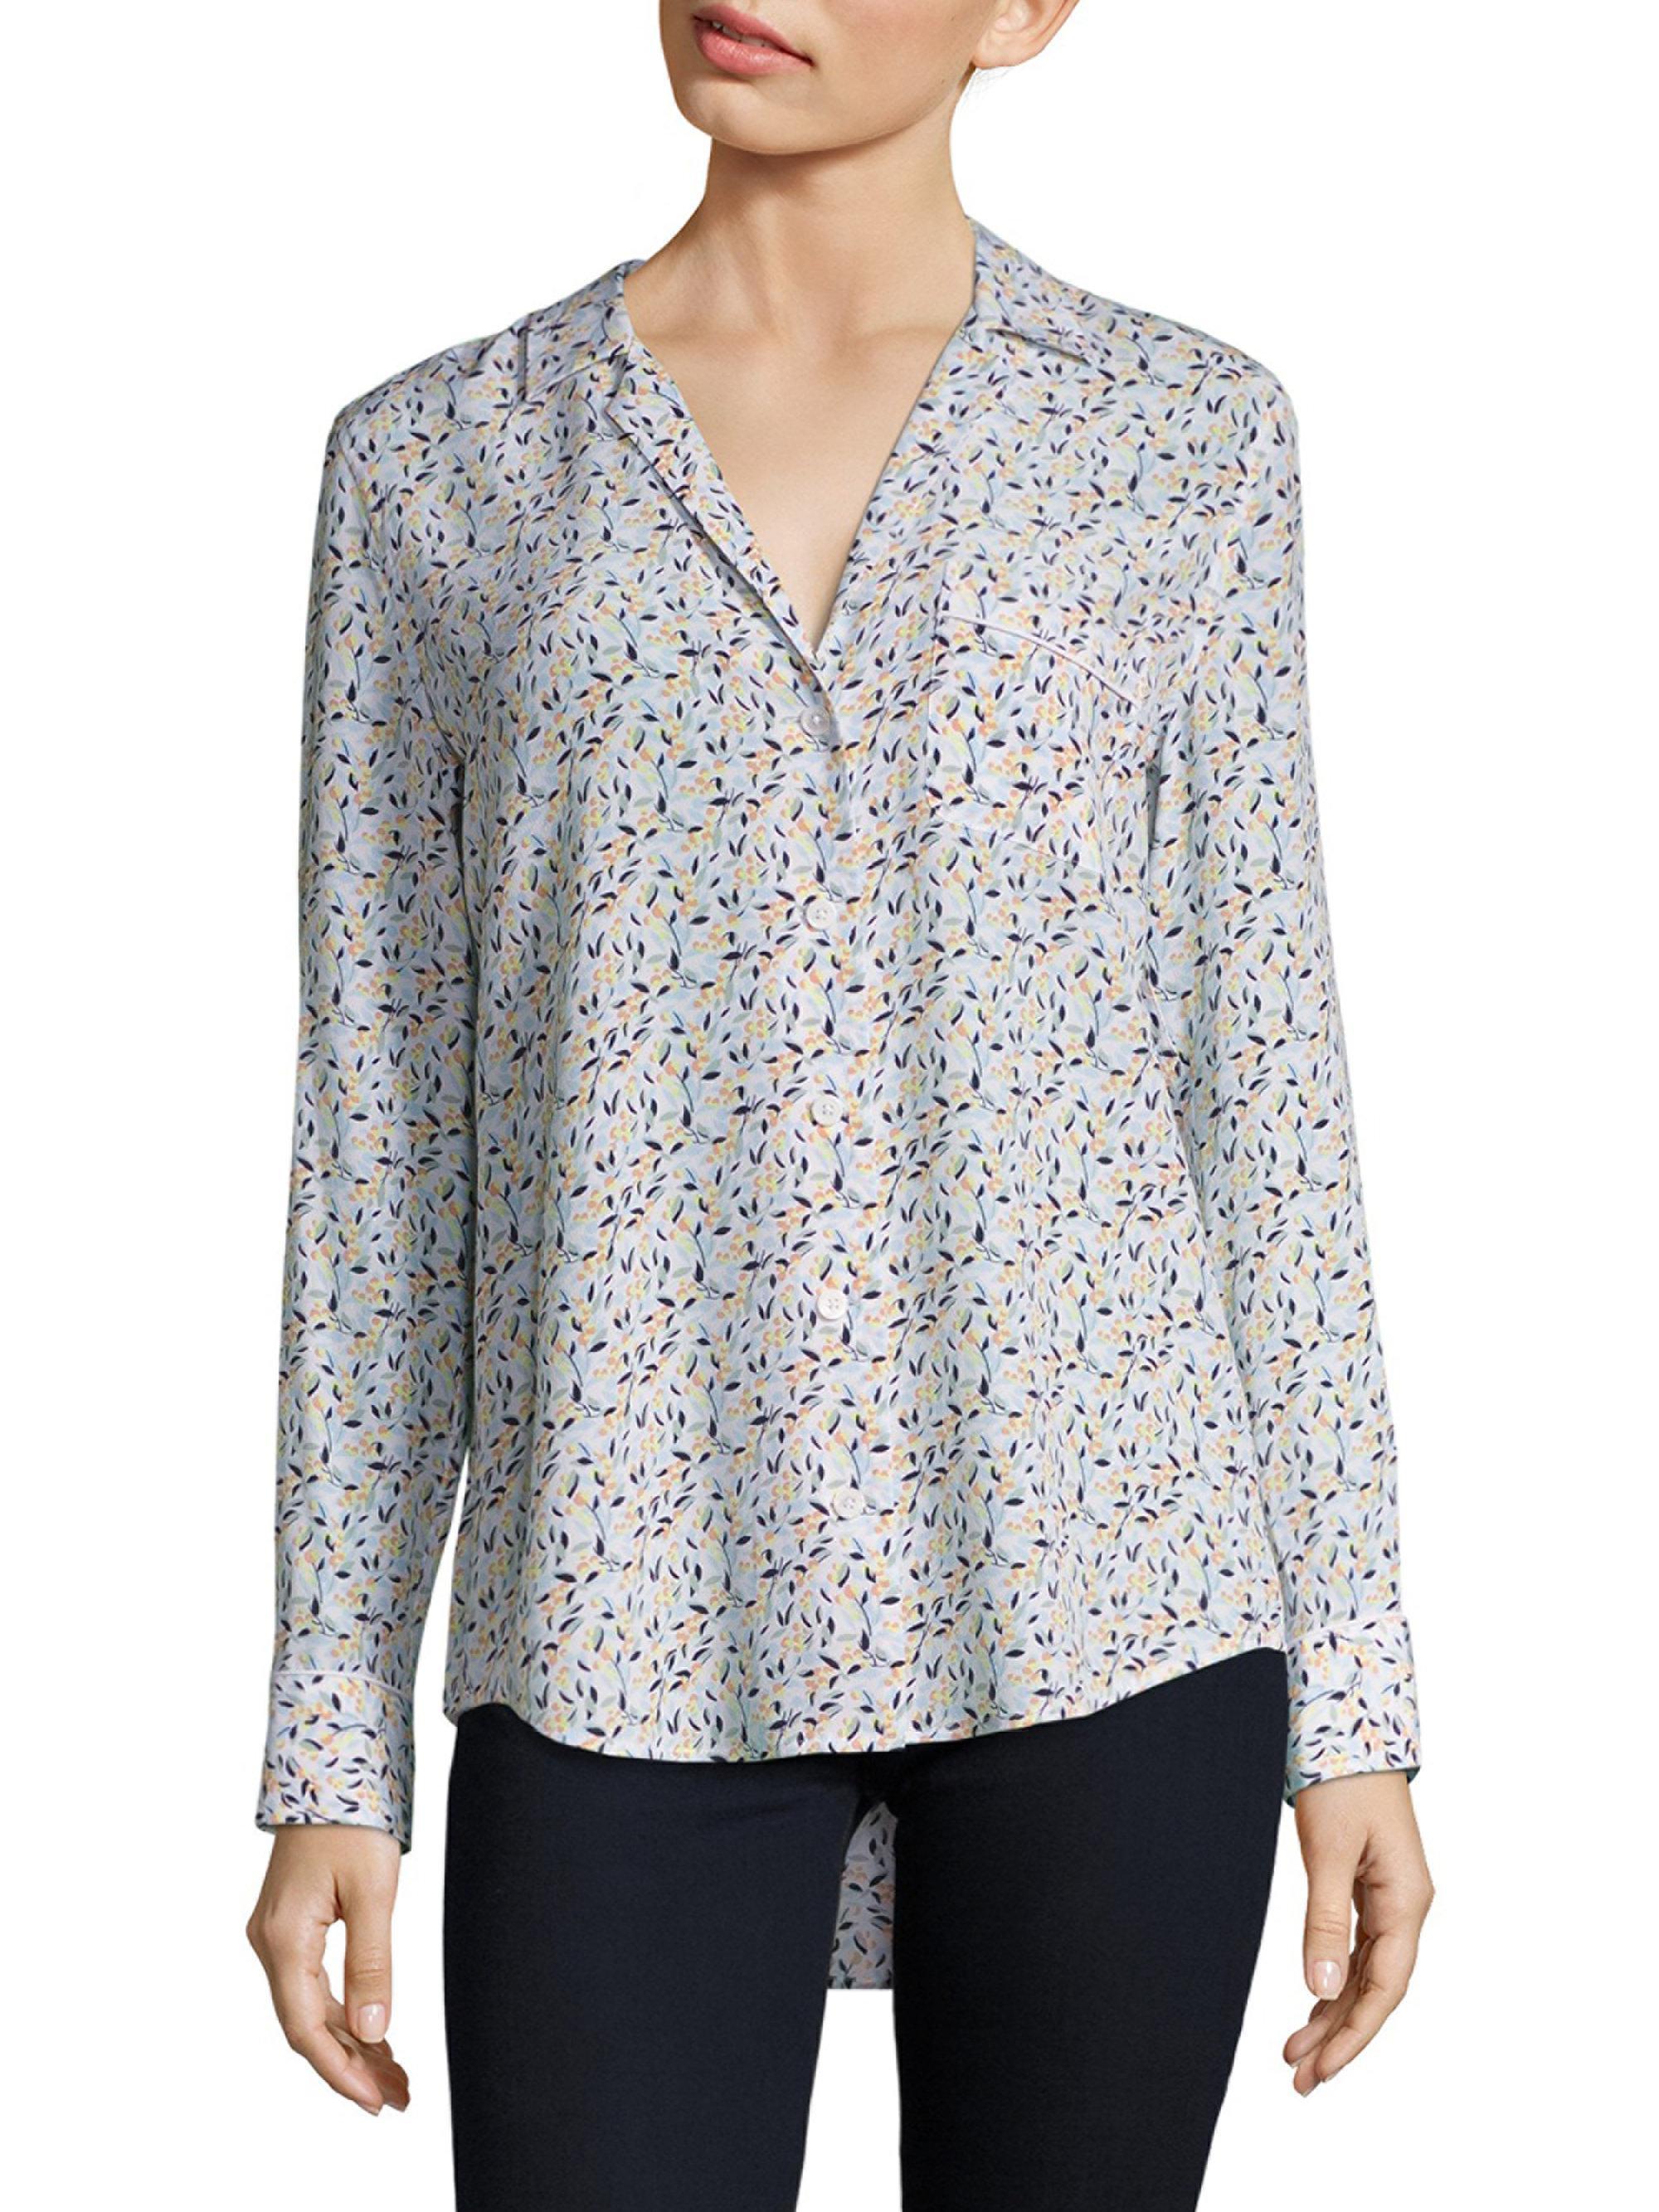 c6c50b7217b546 Lyst - Equipment Kiera Floral-print Silk Shirt in White